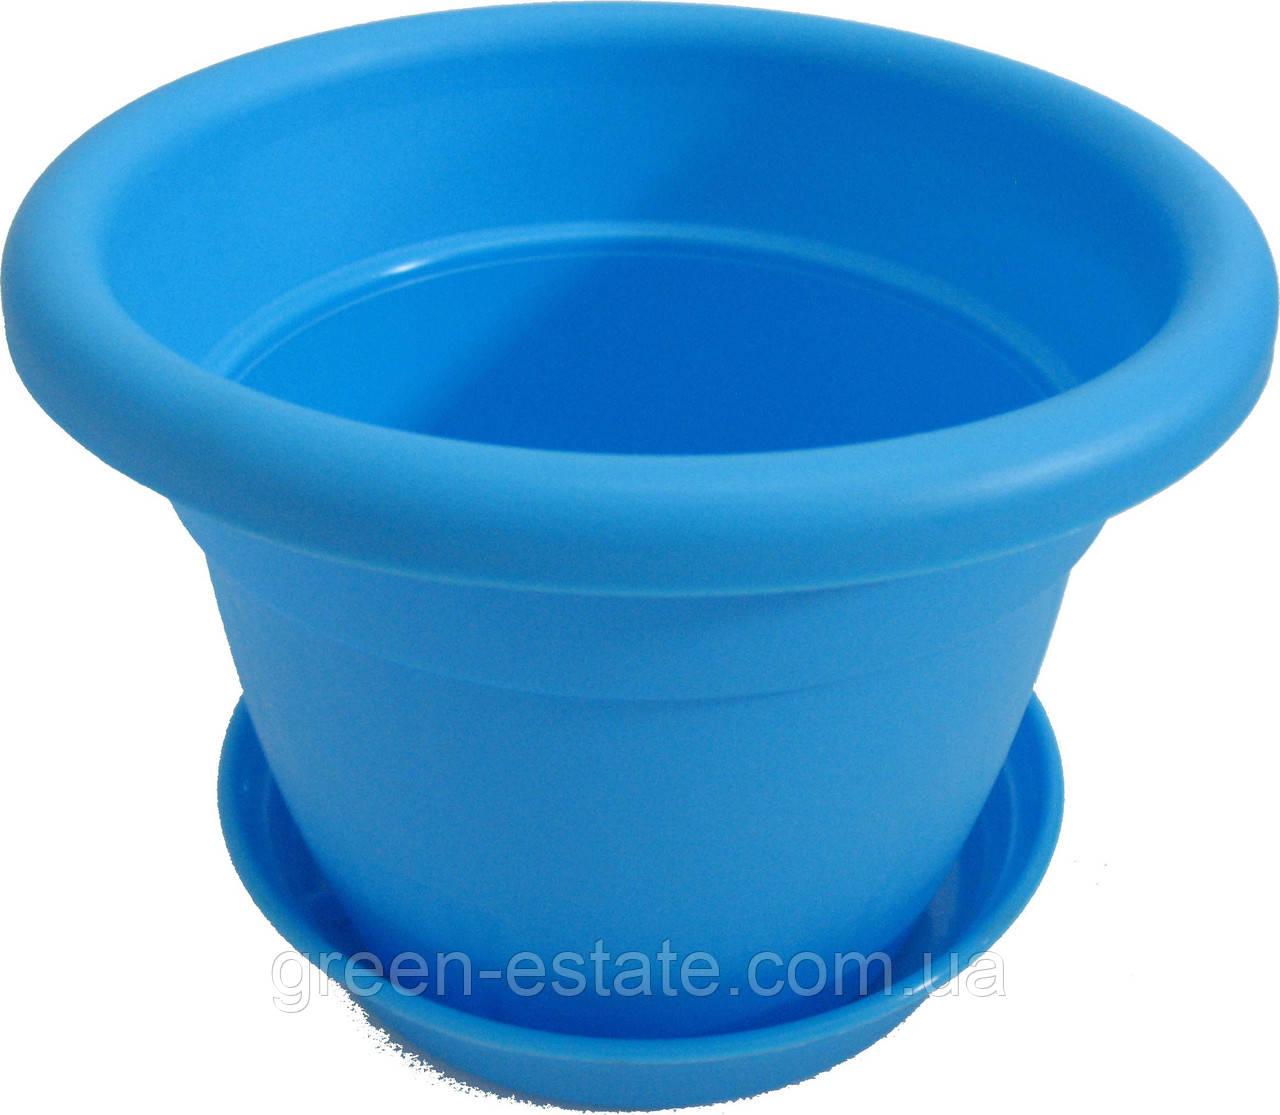 Вазон Антик 10 0,5 л синий